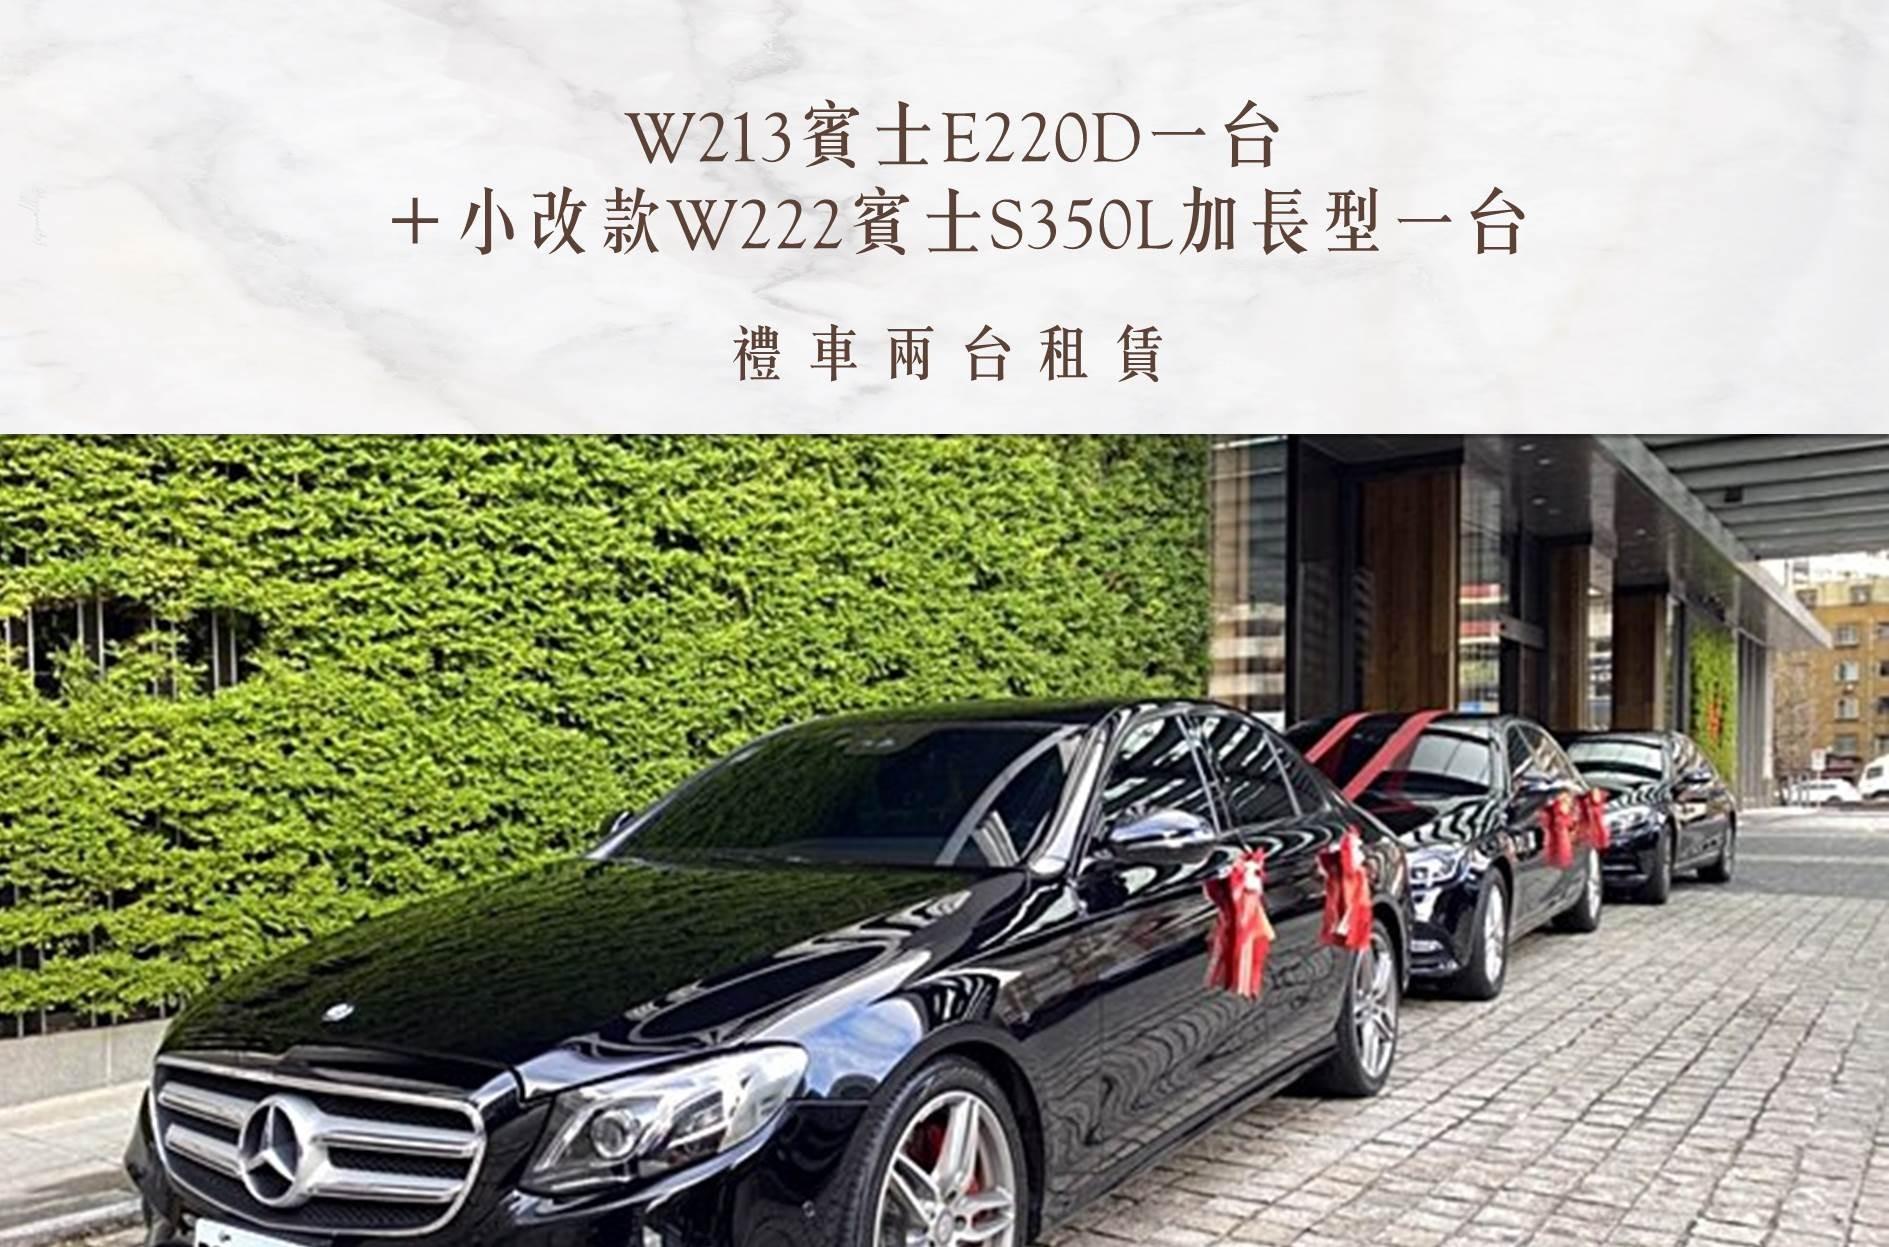 W213賓士E220D一台+小改款W222賓士S350L加長型一台